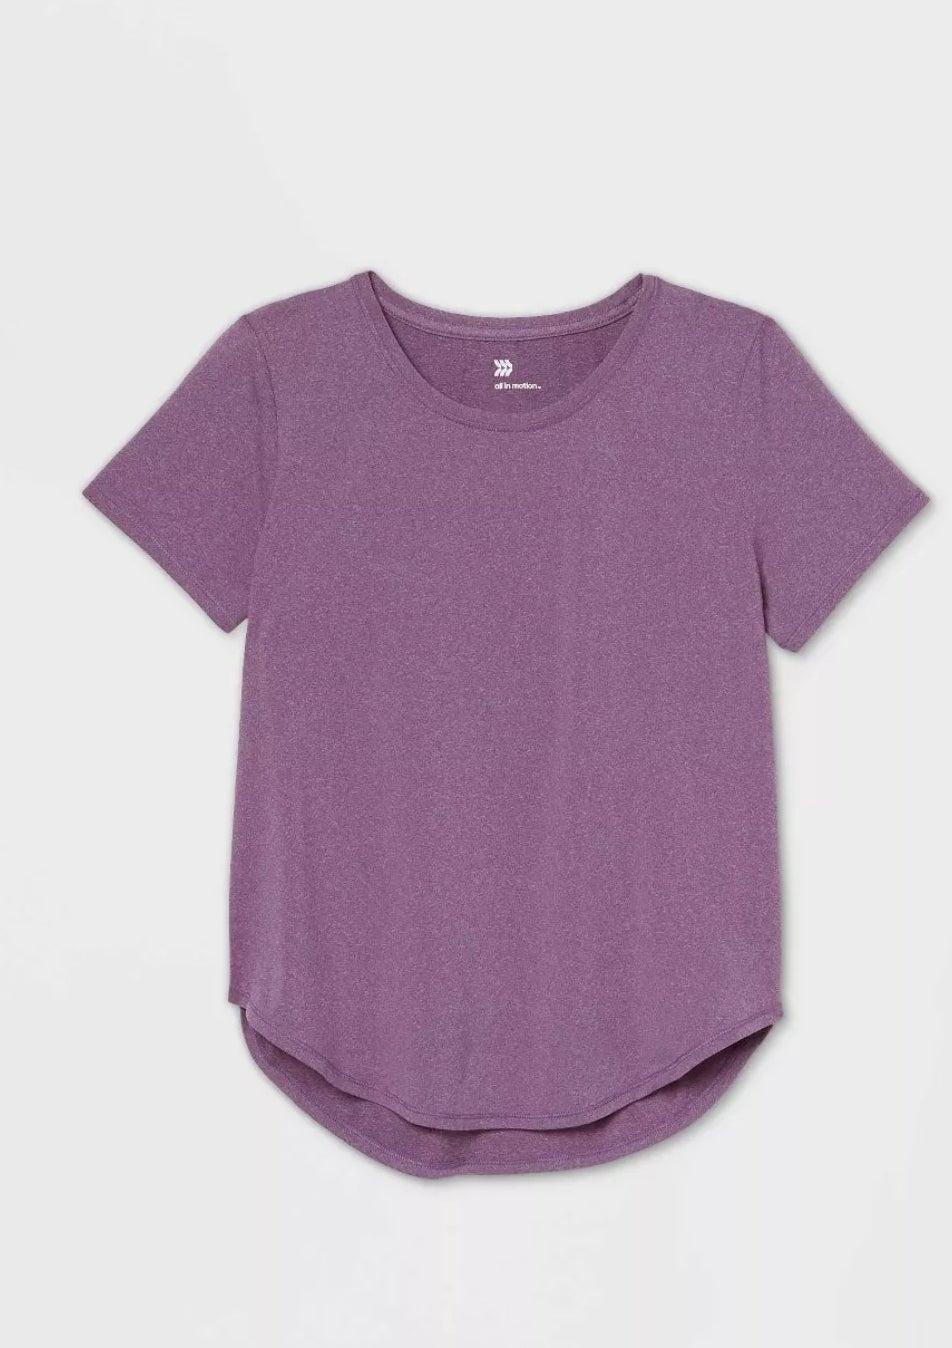 A purple short sleeve top